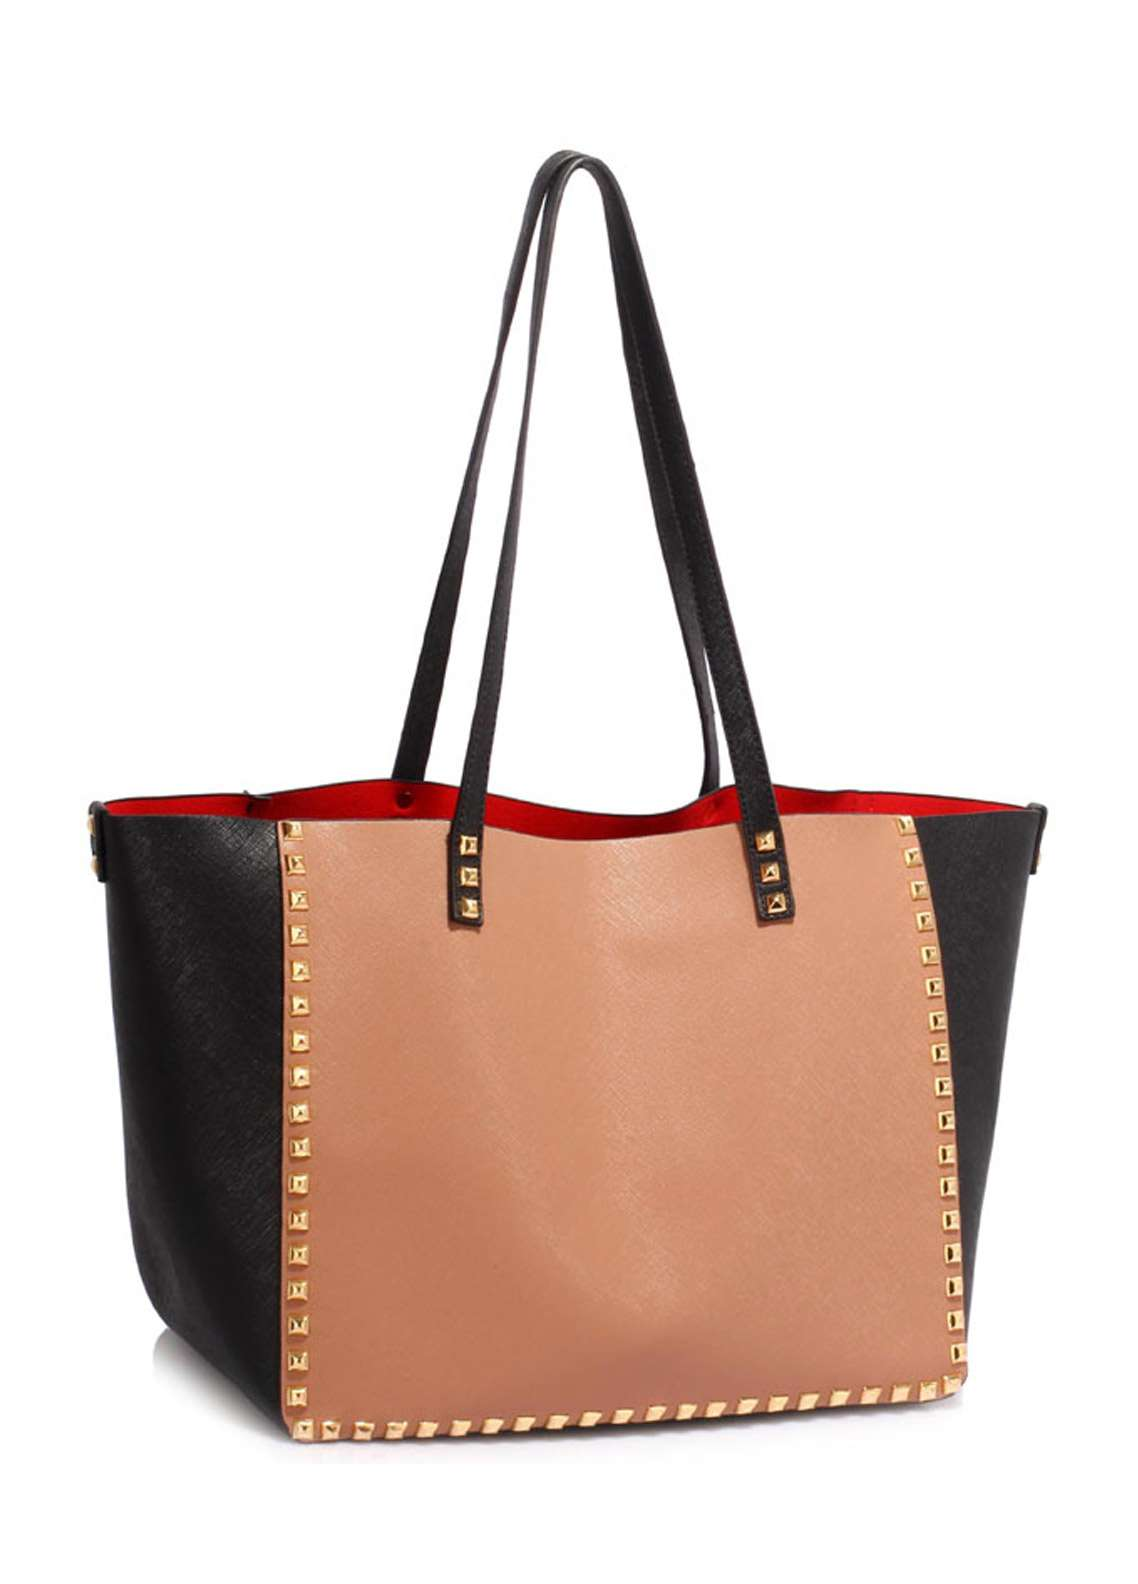 Leesun London Faux Leather Tote Bags for Women  Multi